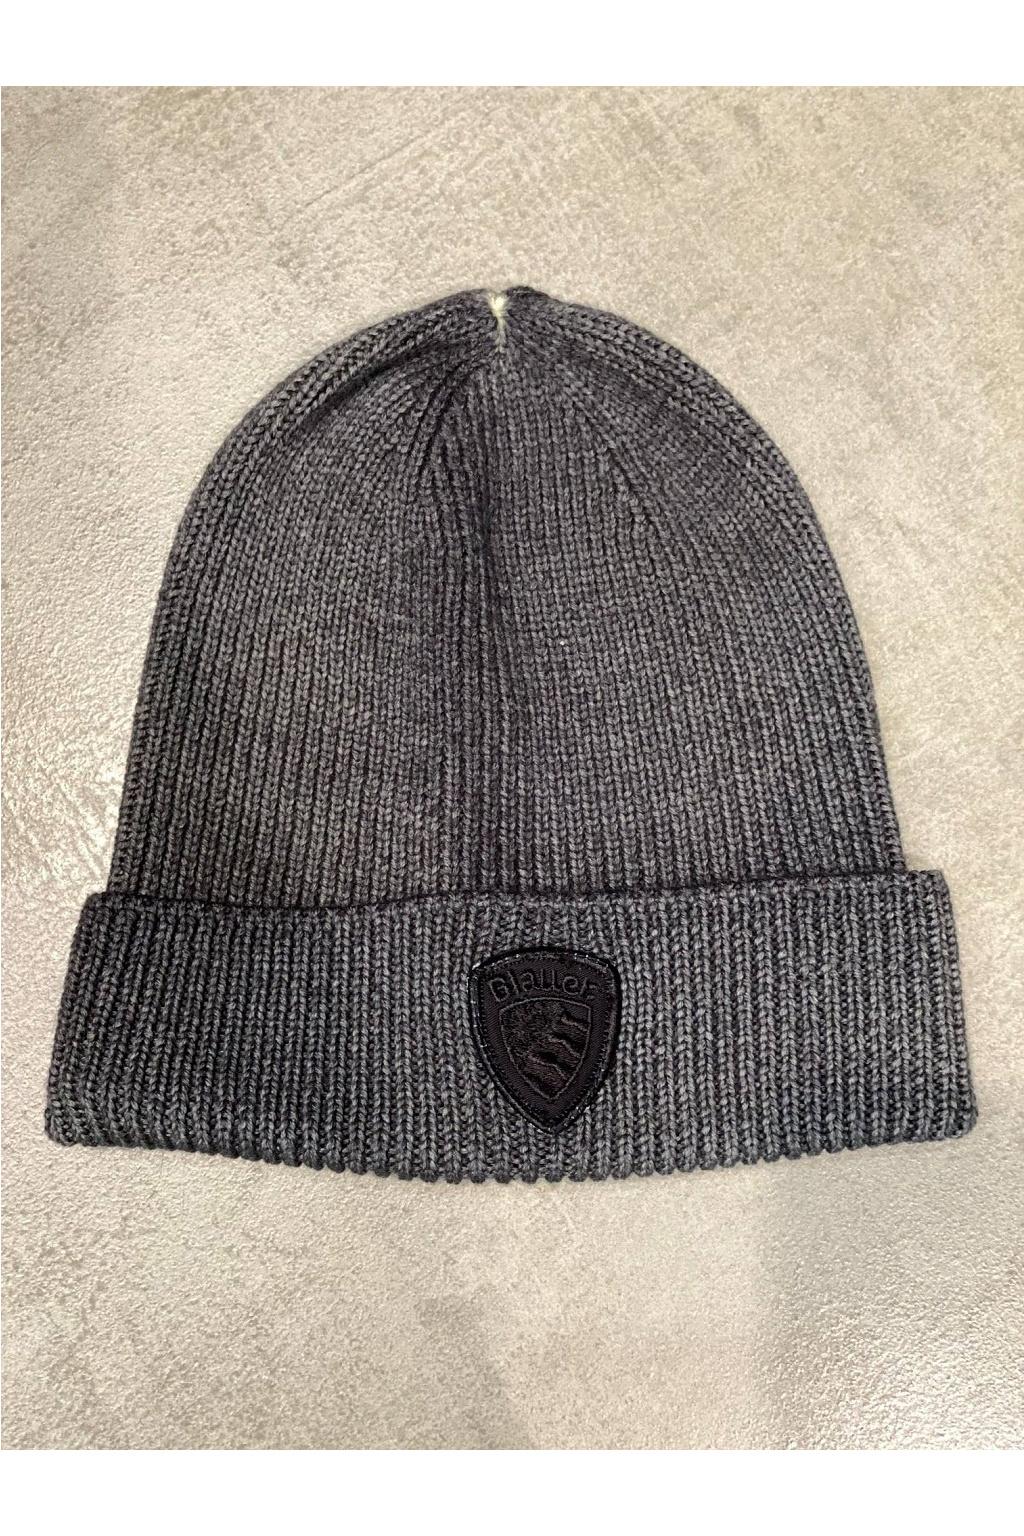 Pánská čepice Blauer 21WBLUA05148 šedá